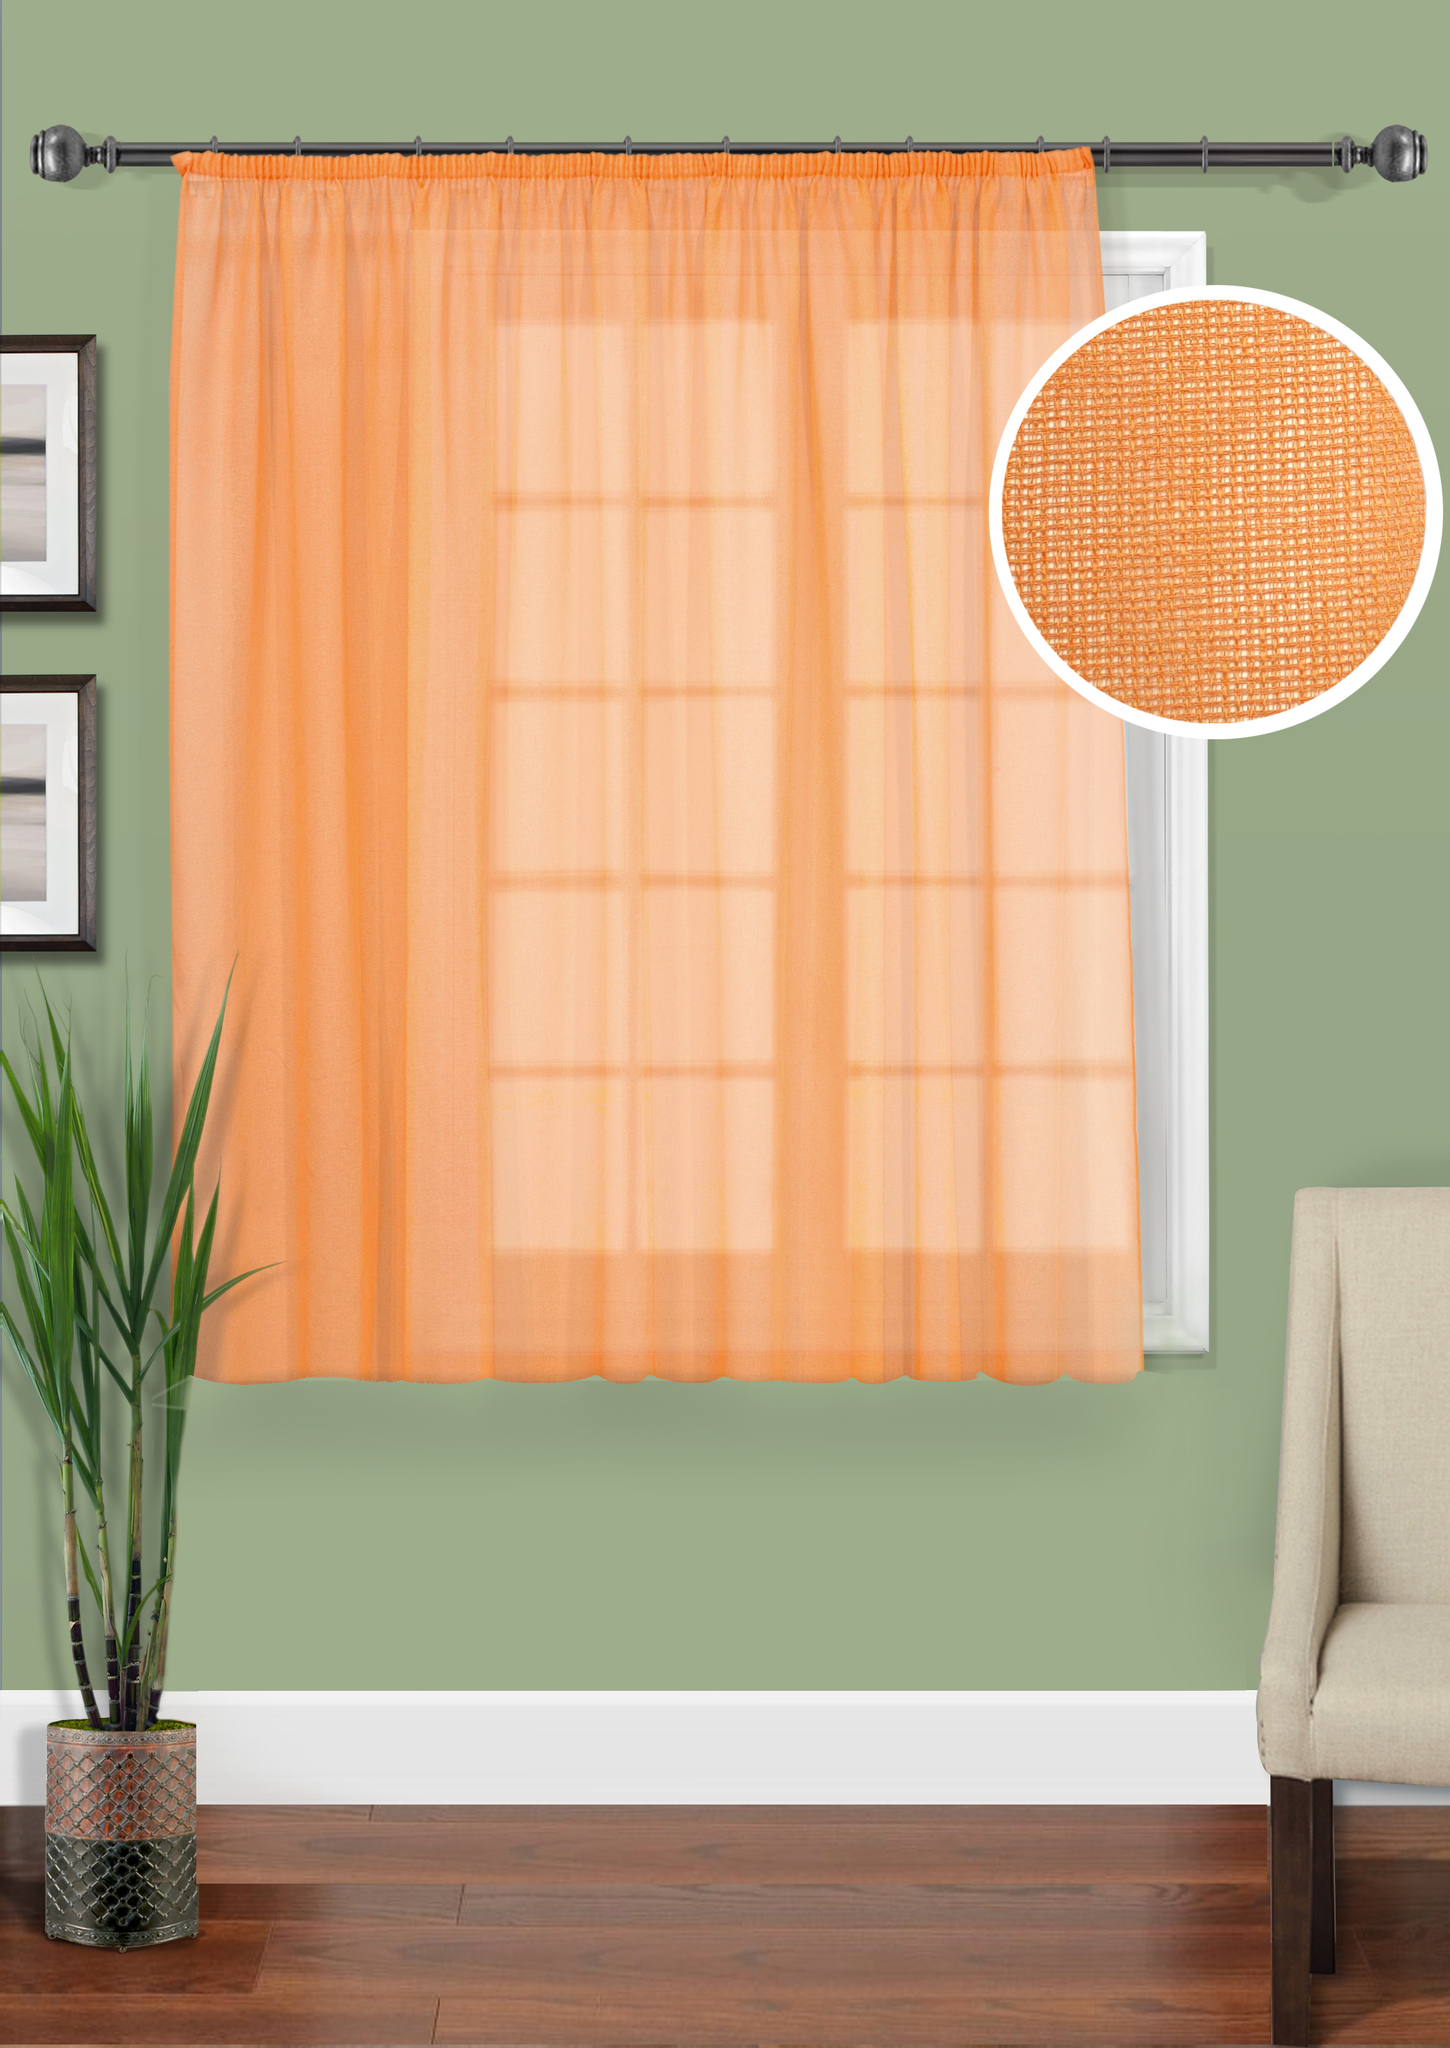 Шторы Kauffort Классические шторы Basicos-M Цвет: Оранжевый шторы kauffort классические шторы barolo